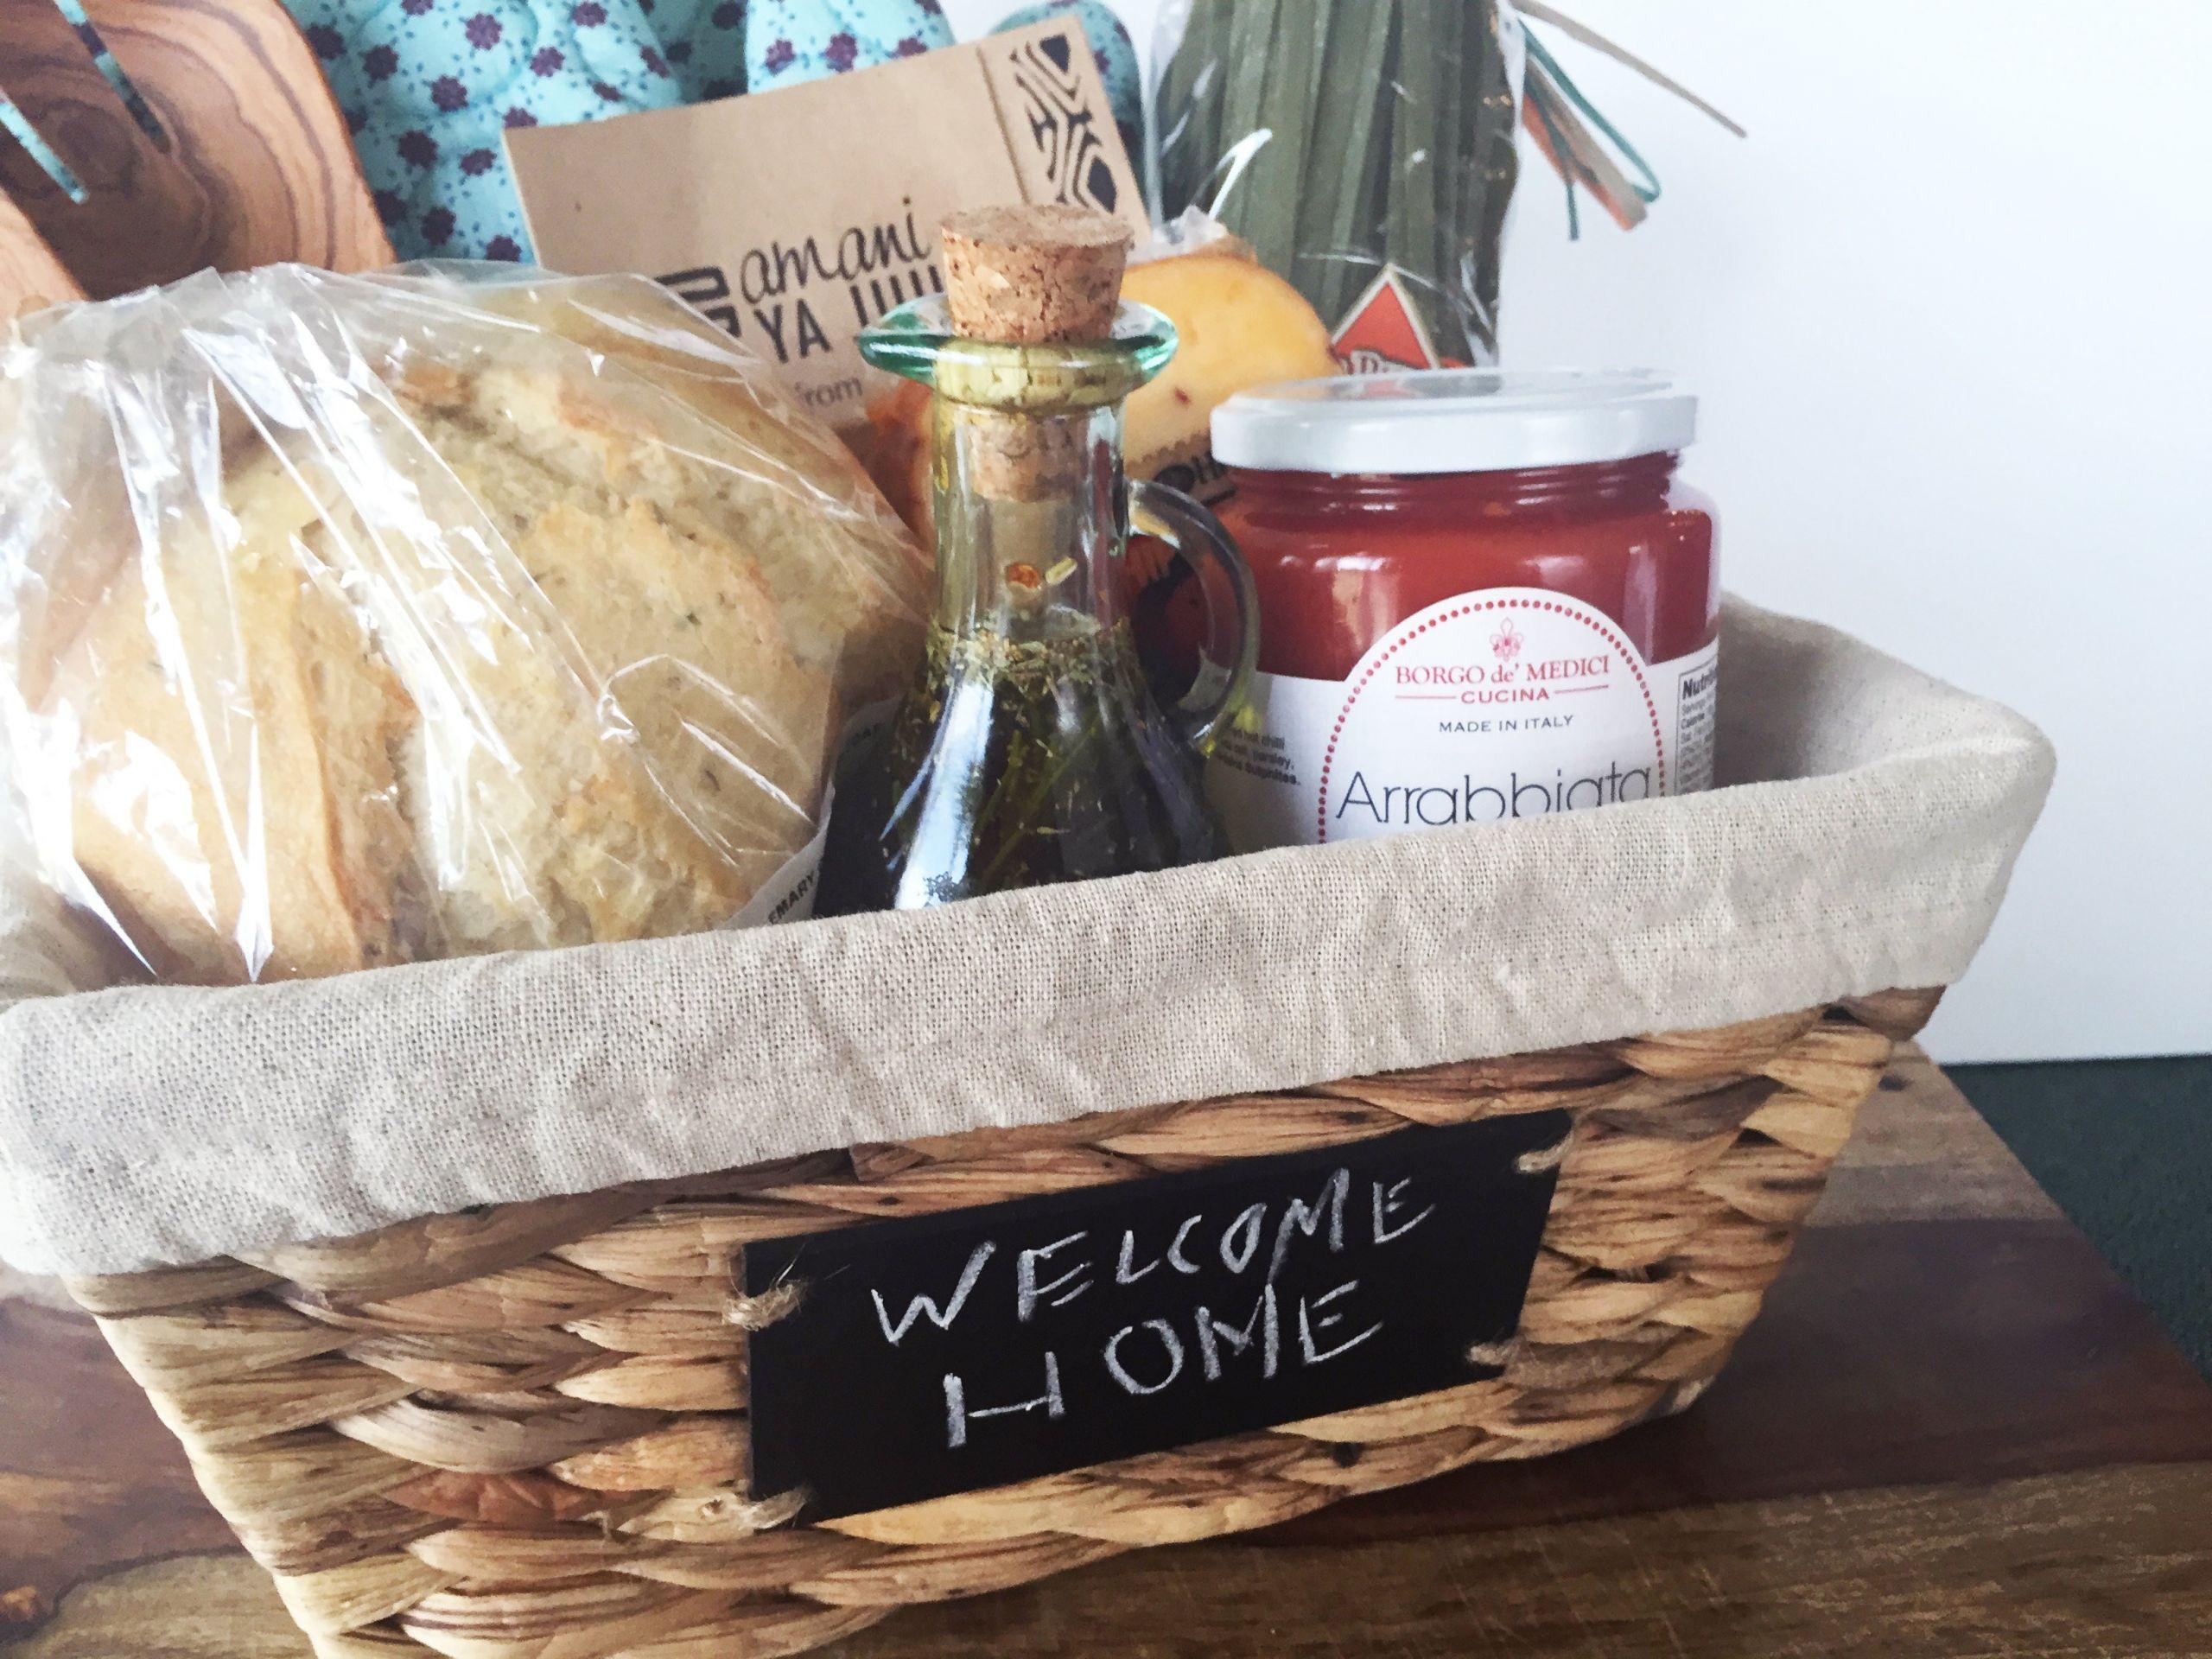 DIY Housewarming Gifts Ideas  DIY HOUSEWARMING GIFT BASKET T A S T Y S O U T H E R N